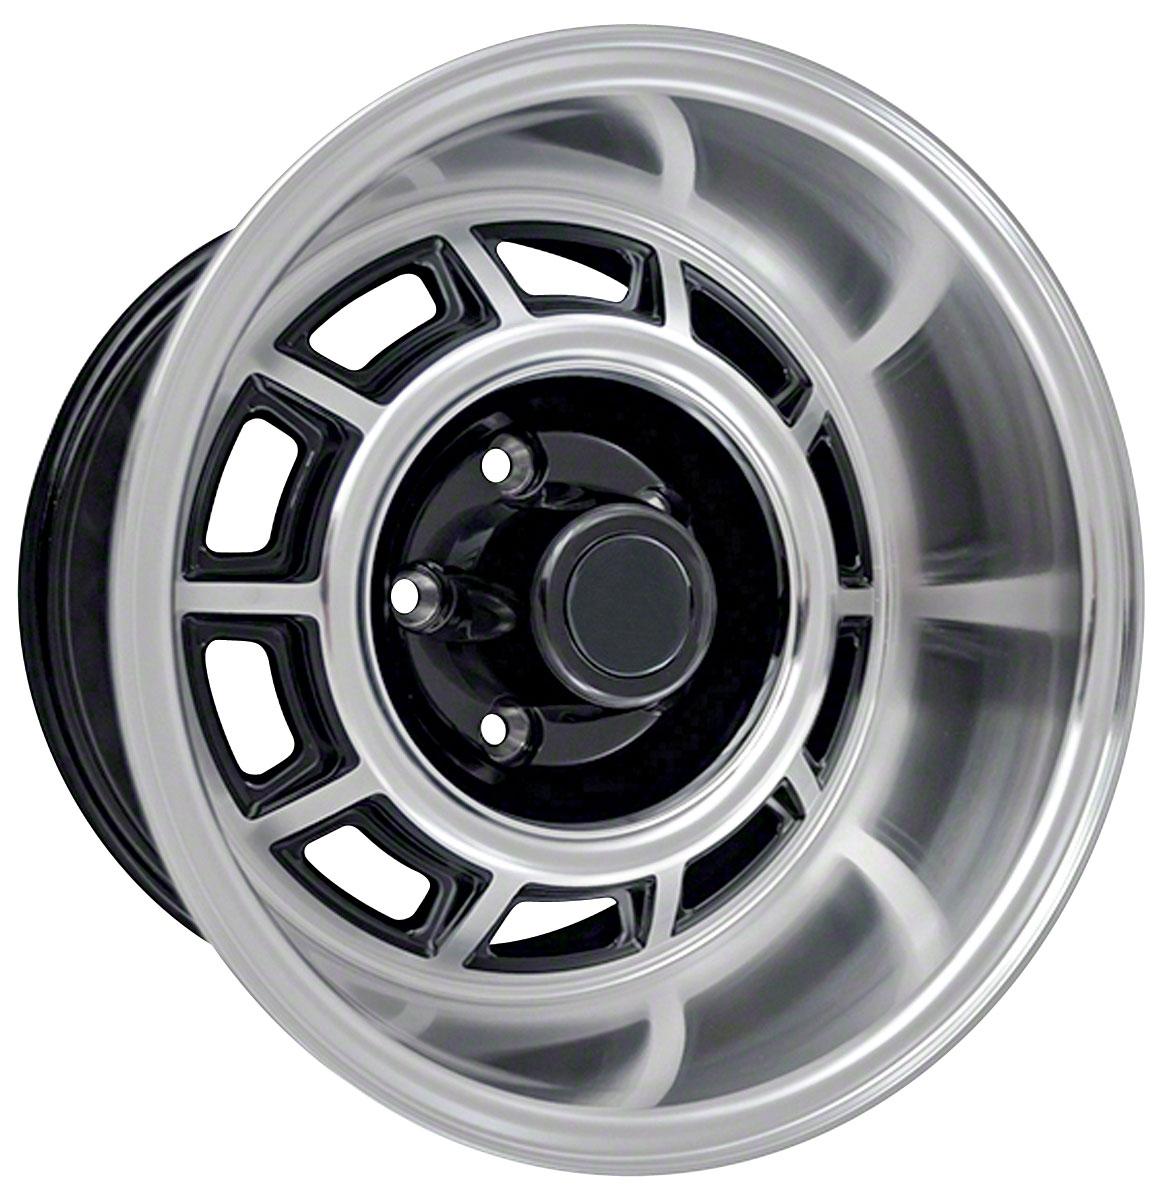 "Wheel, Aluminum, 1986-87 Grand National, 15"" X 10"", 4-1/2"" BS"